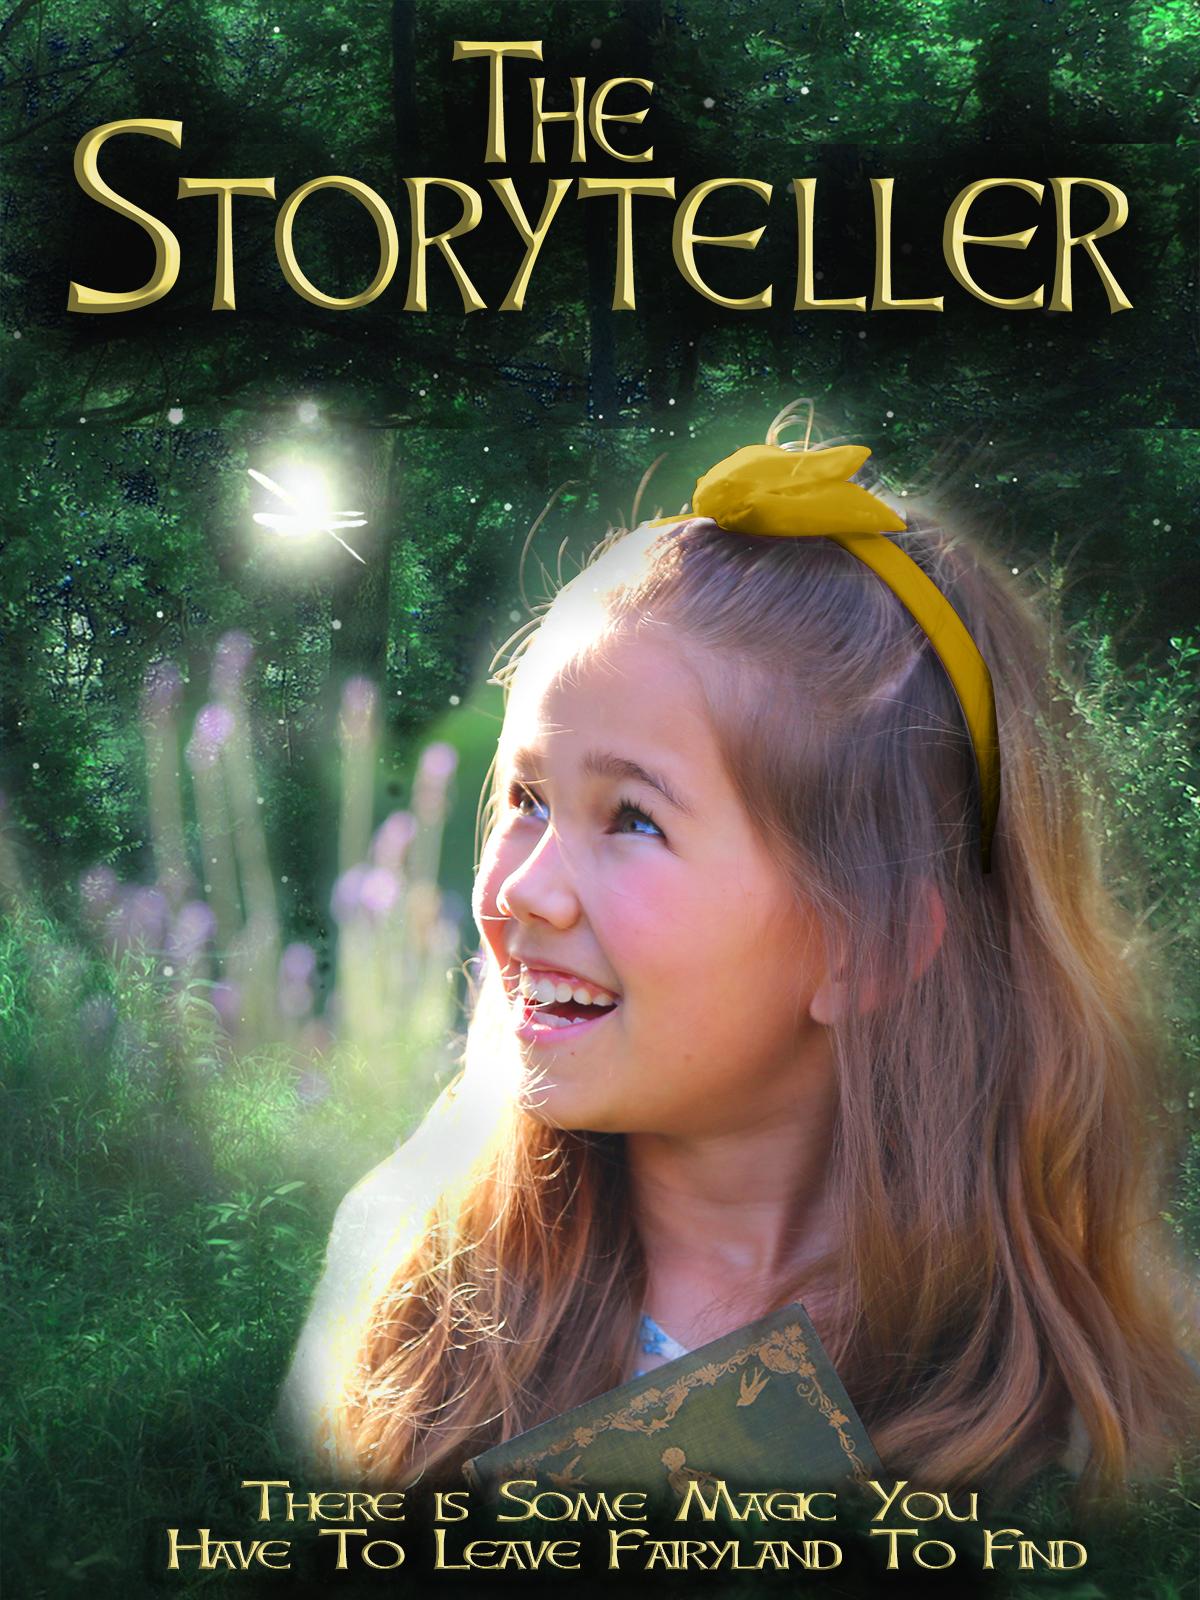 The Storyteller (2018) HDRip